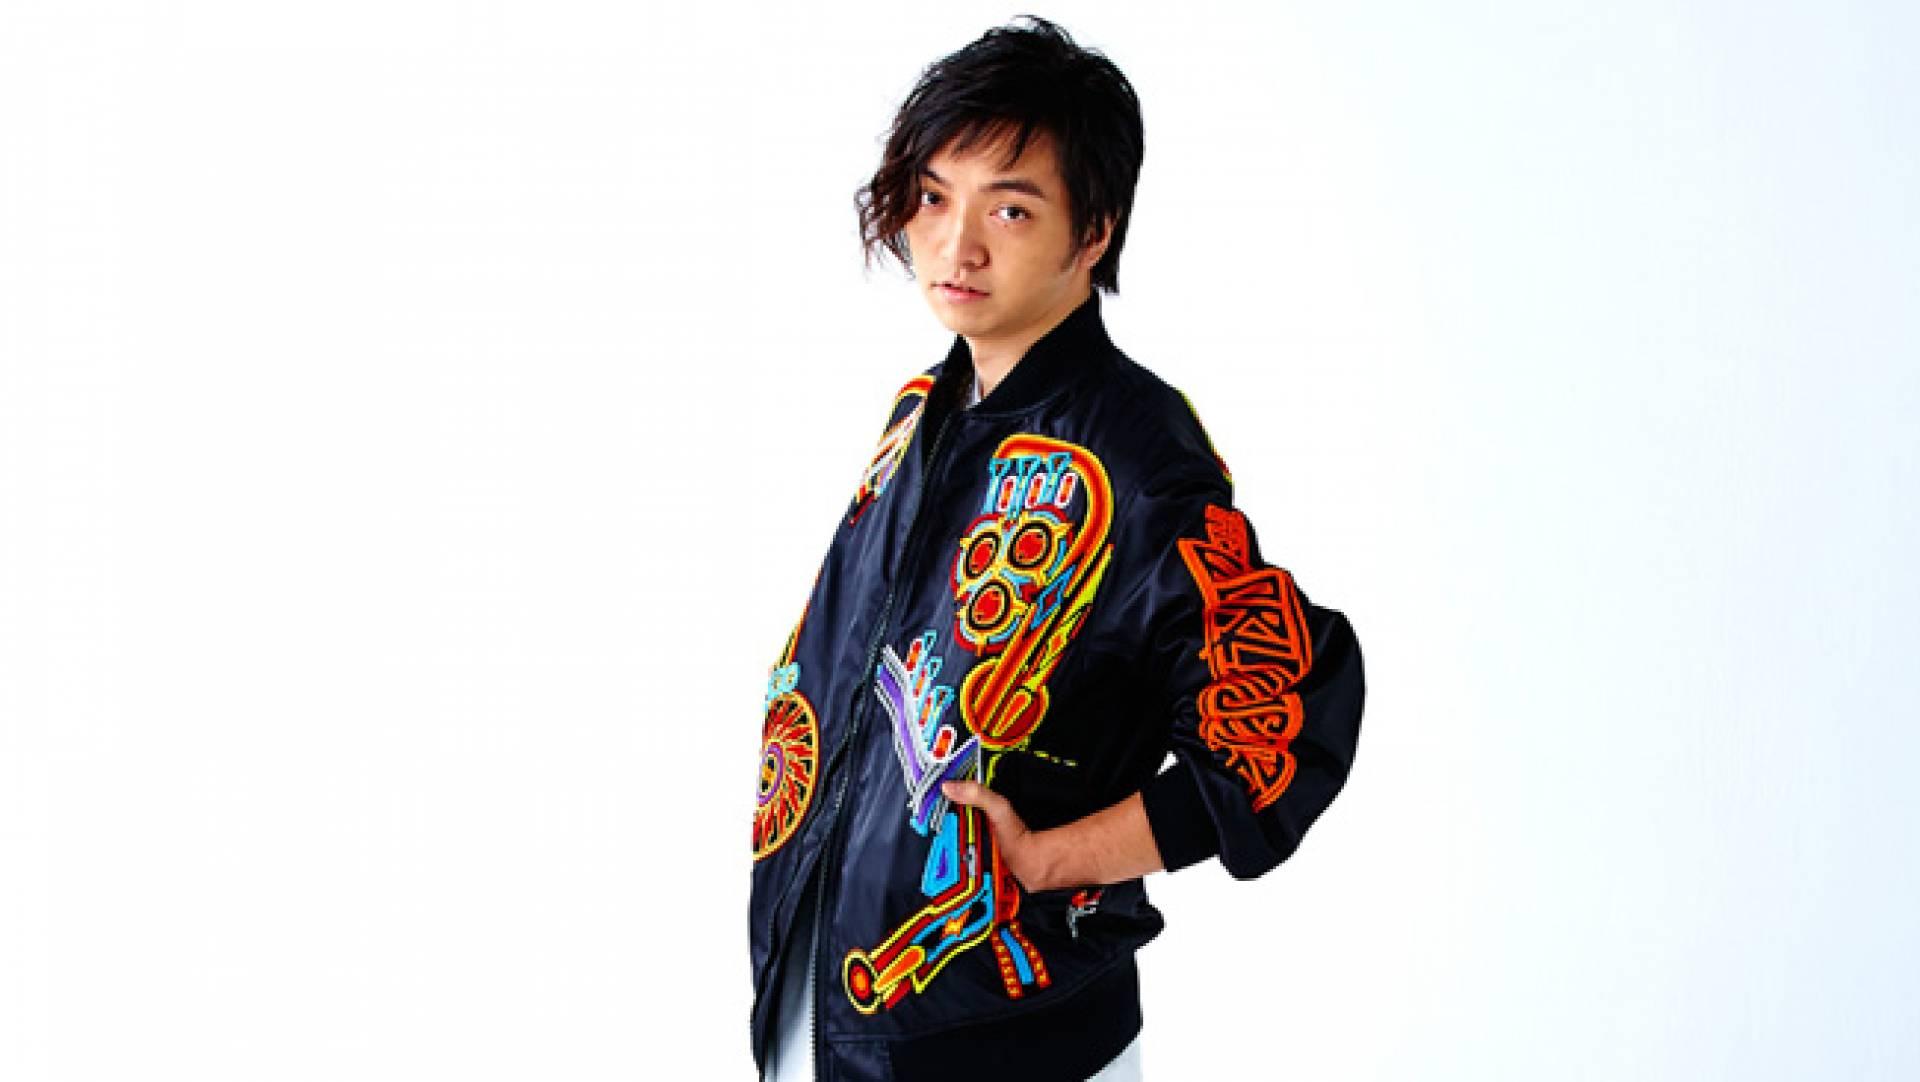 Miura Daichi